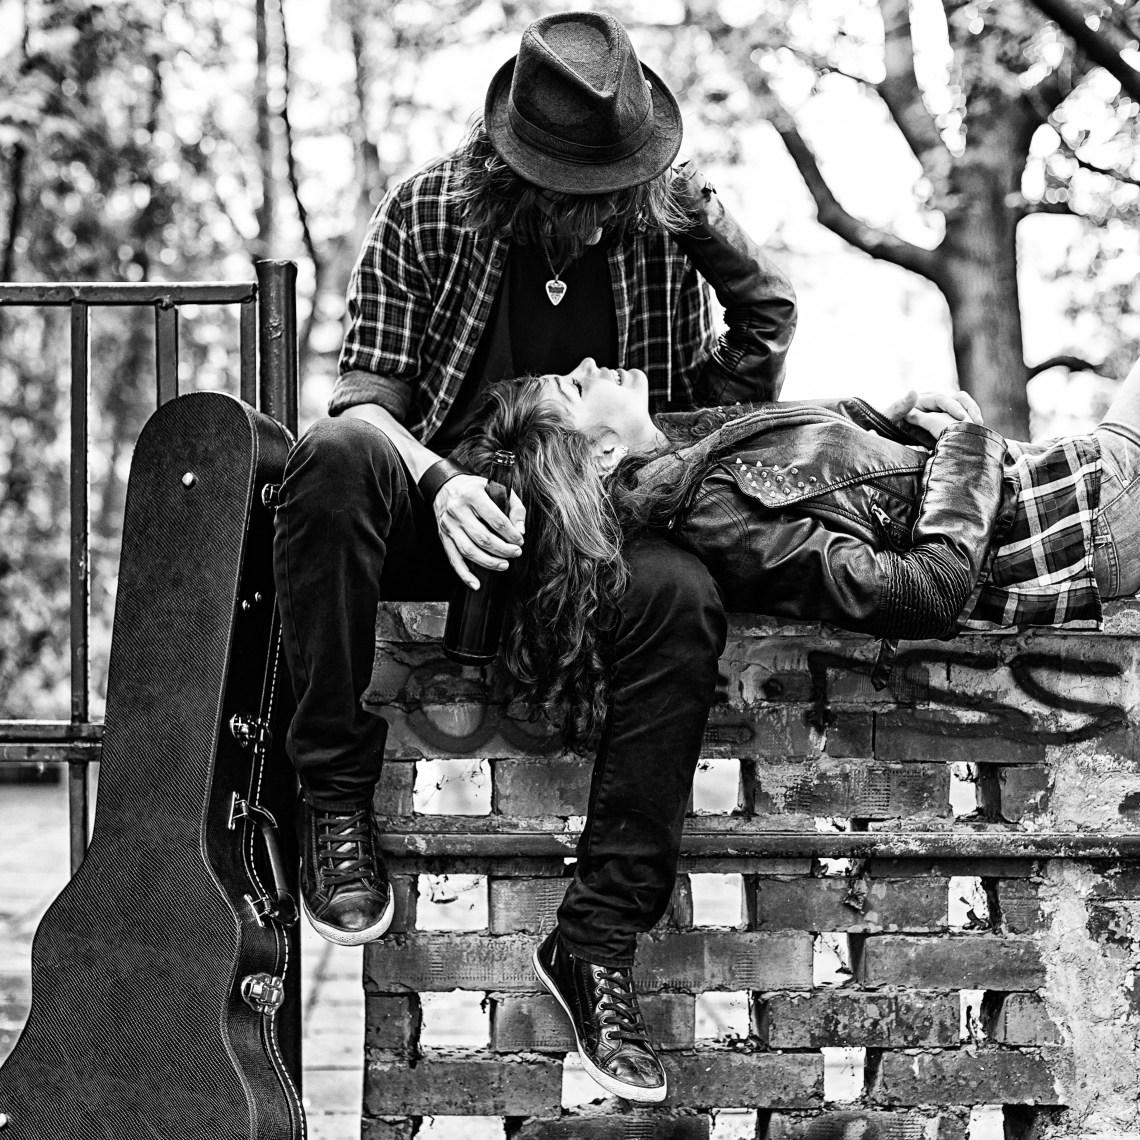 istockphoto.com / Martin Dimitrov